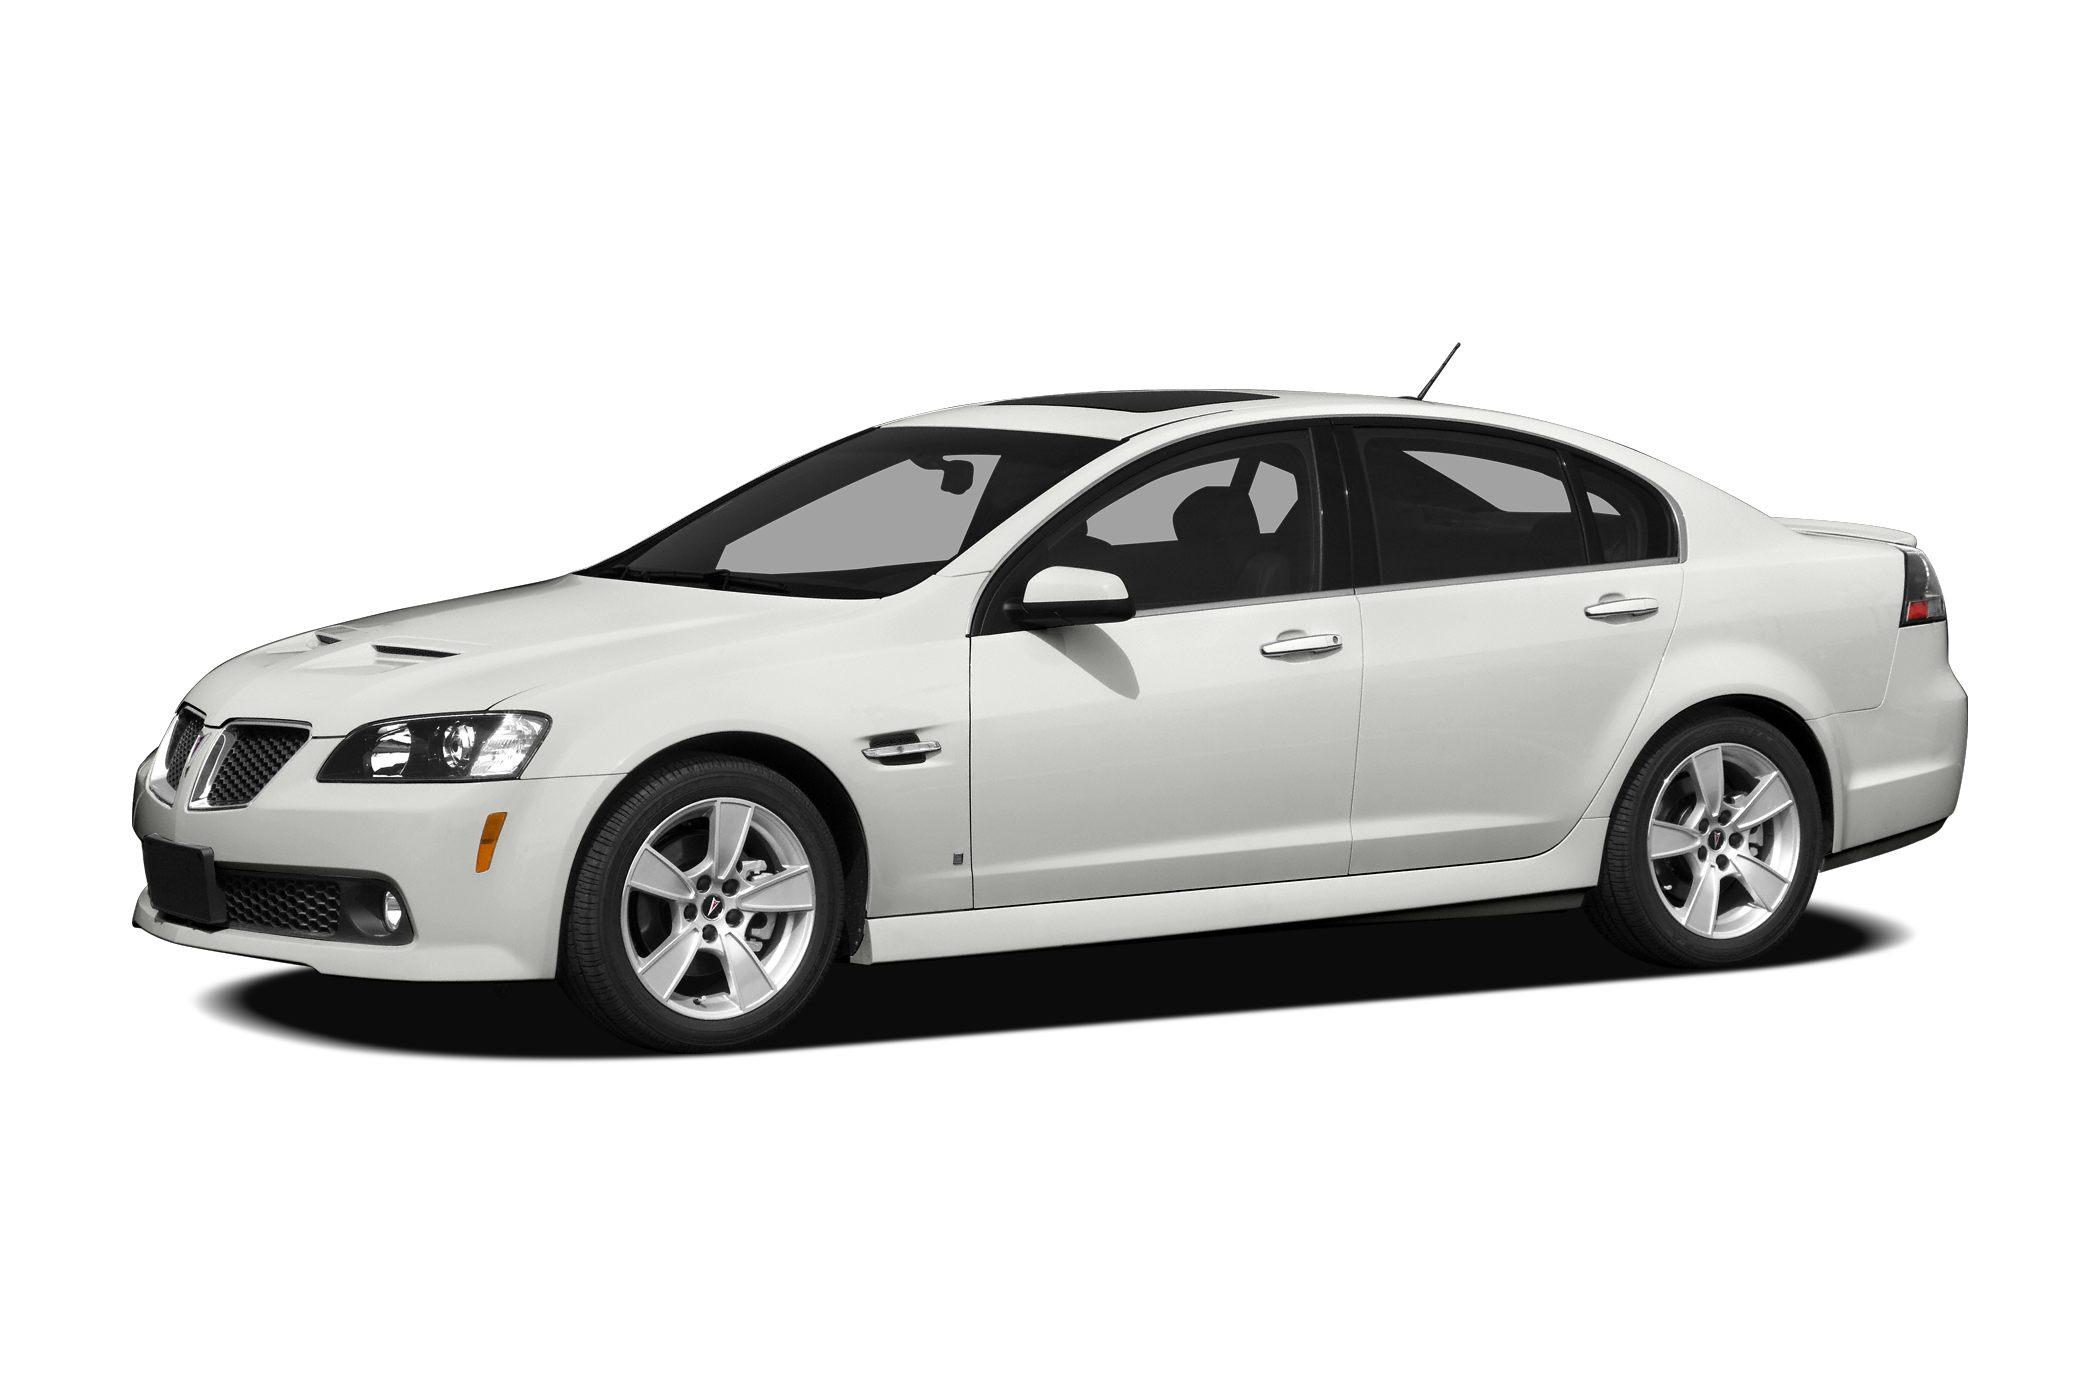 2008 pontiac g8 gt 4dr sedan specs and prices g35 v8 engine ponac g8 v8 engine diagram #32